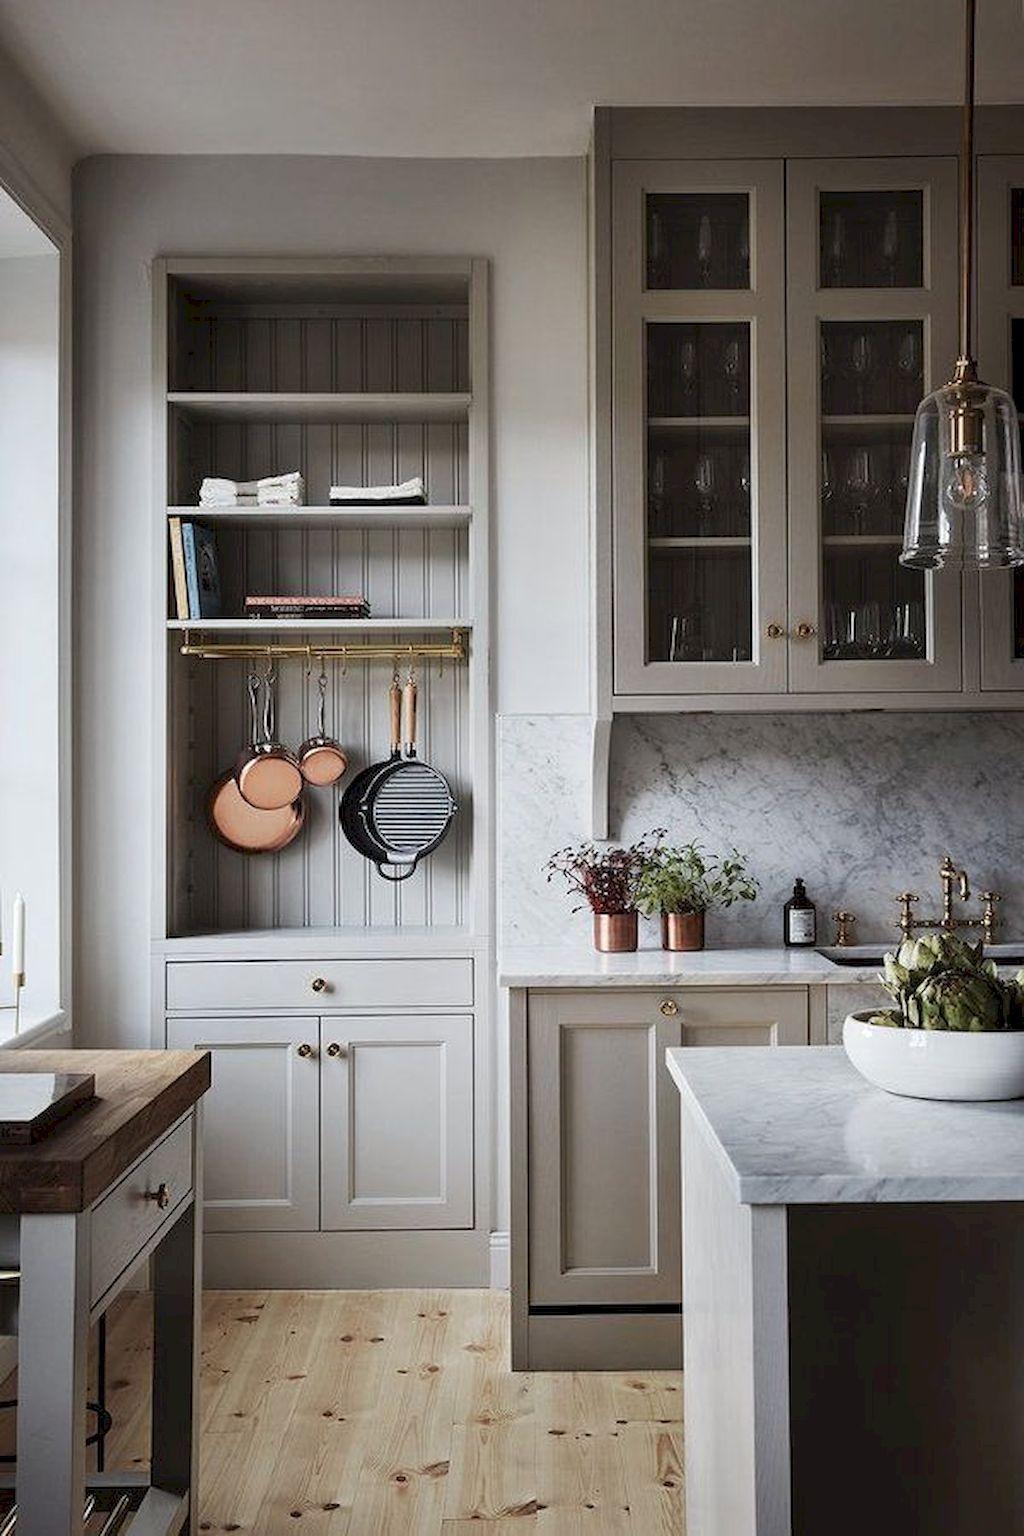 Adorable 75 Farmhouse Gray Kitchen Cabinet Design Ideas Https Decorecor Com 75 Farmhouse Gray Kitchen Cabin Kitchen Renovation Kitchen Design Kitchen Remodel